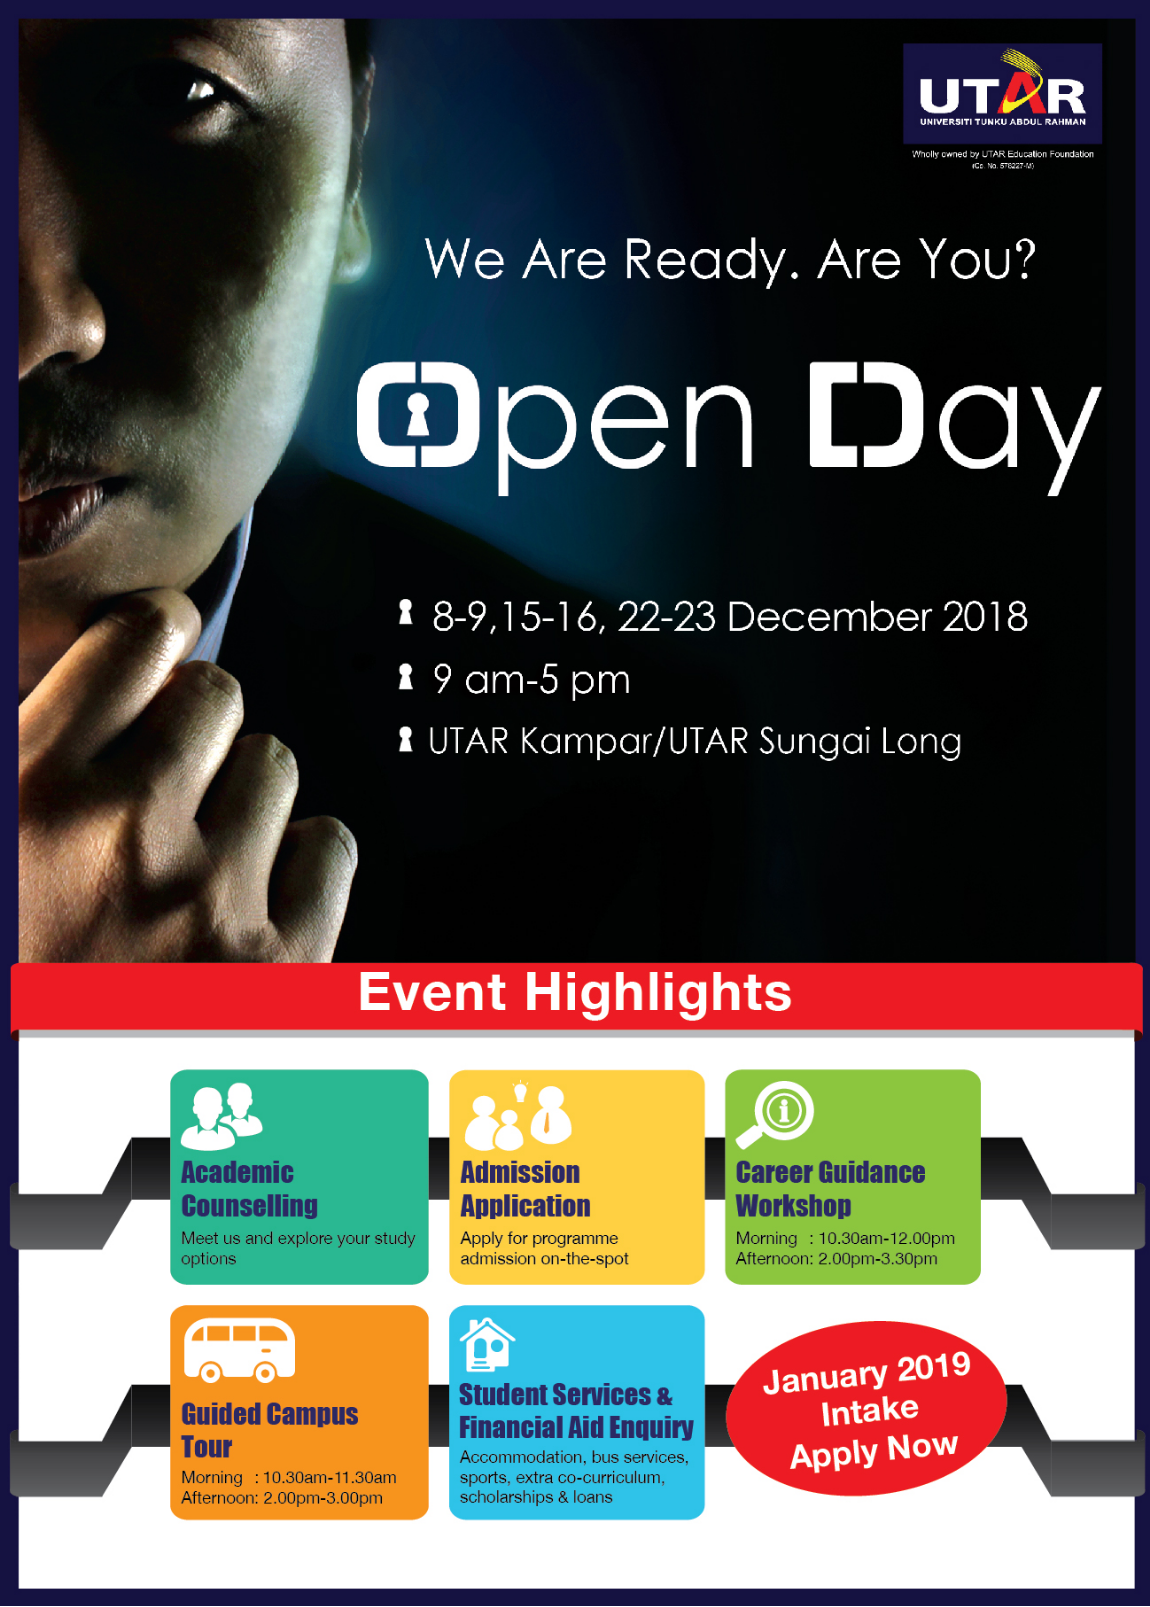 openday-malaysian-university-UTAR-??